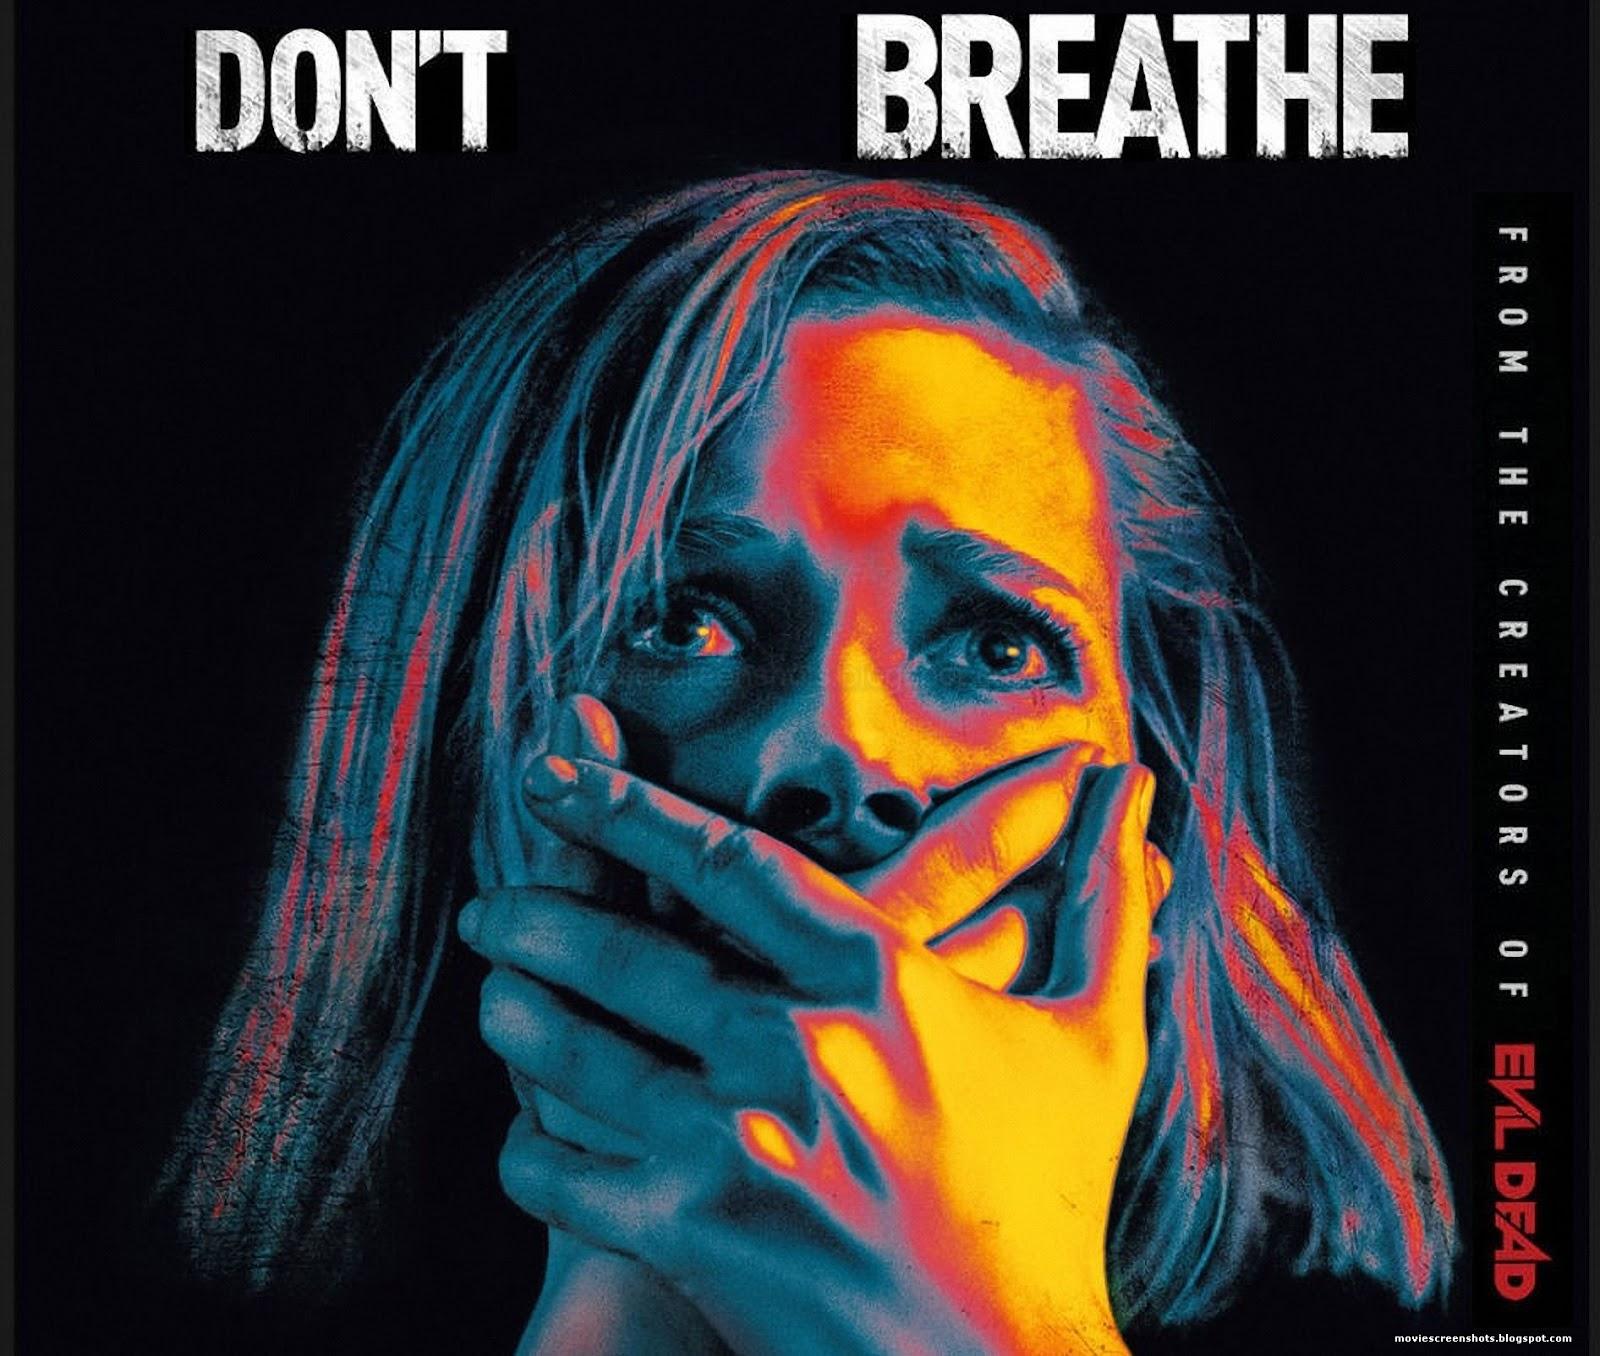 dont breath